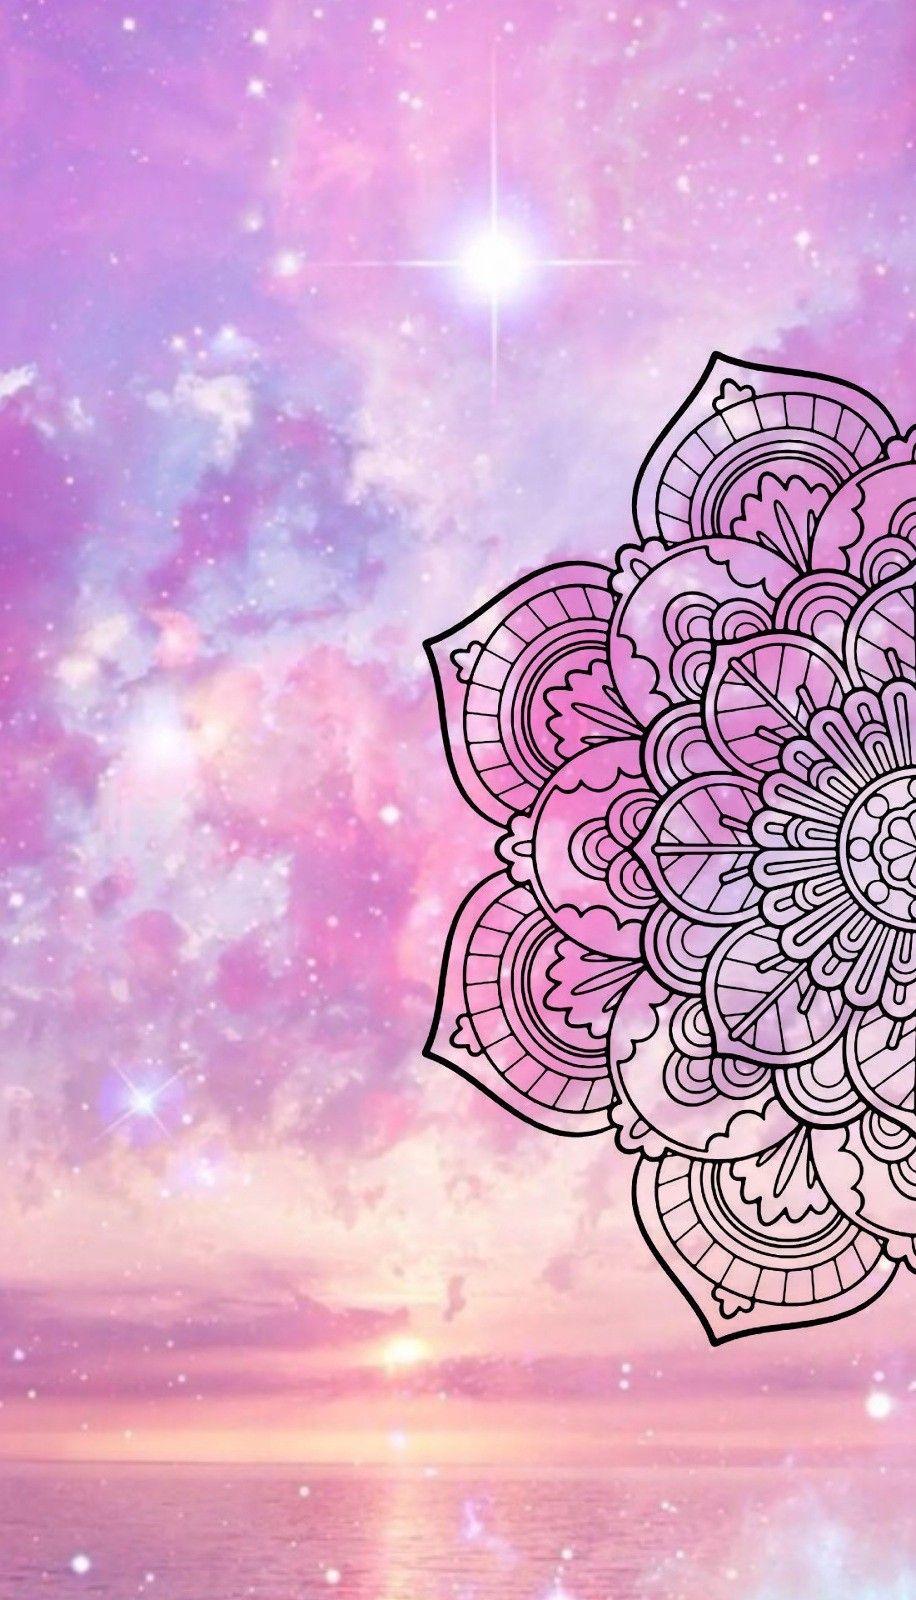 Colourful mandala  ideas para wallpaper  Mandala, Wallpaper y Cellphone wallpaper